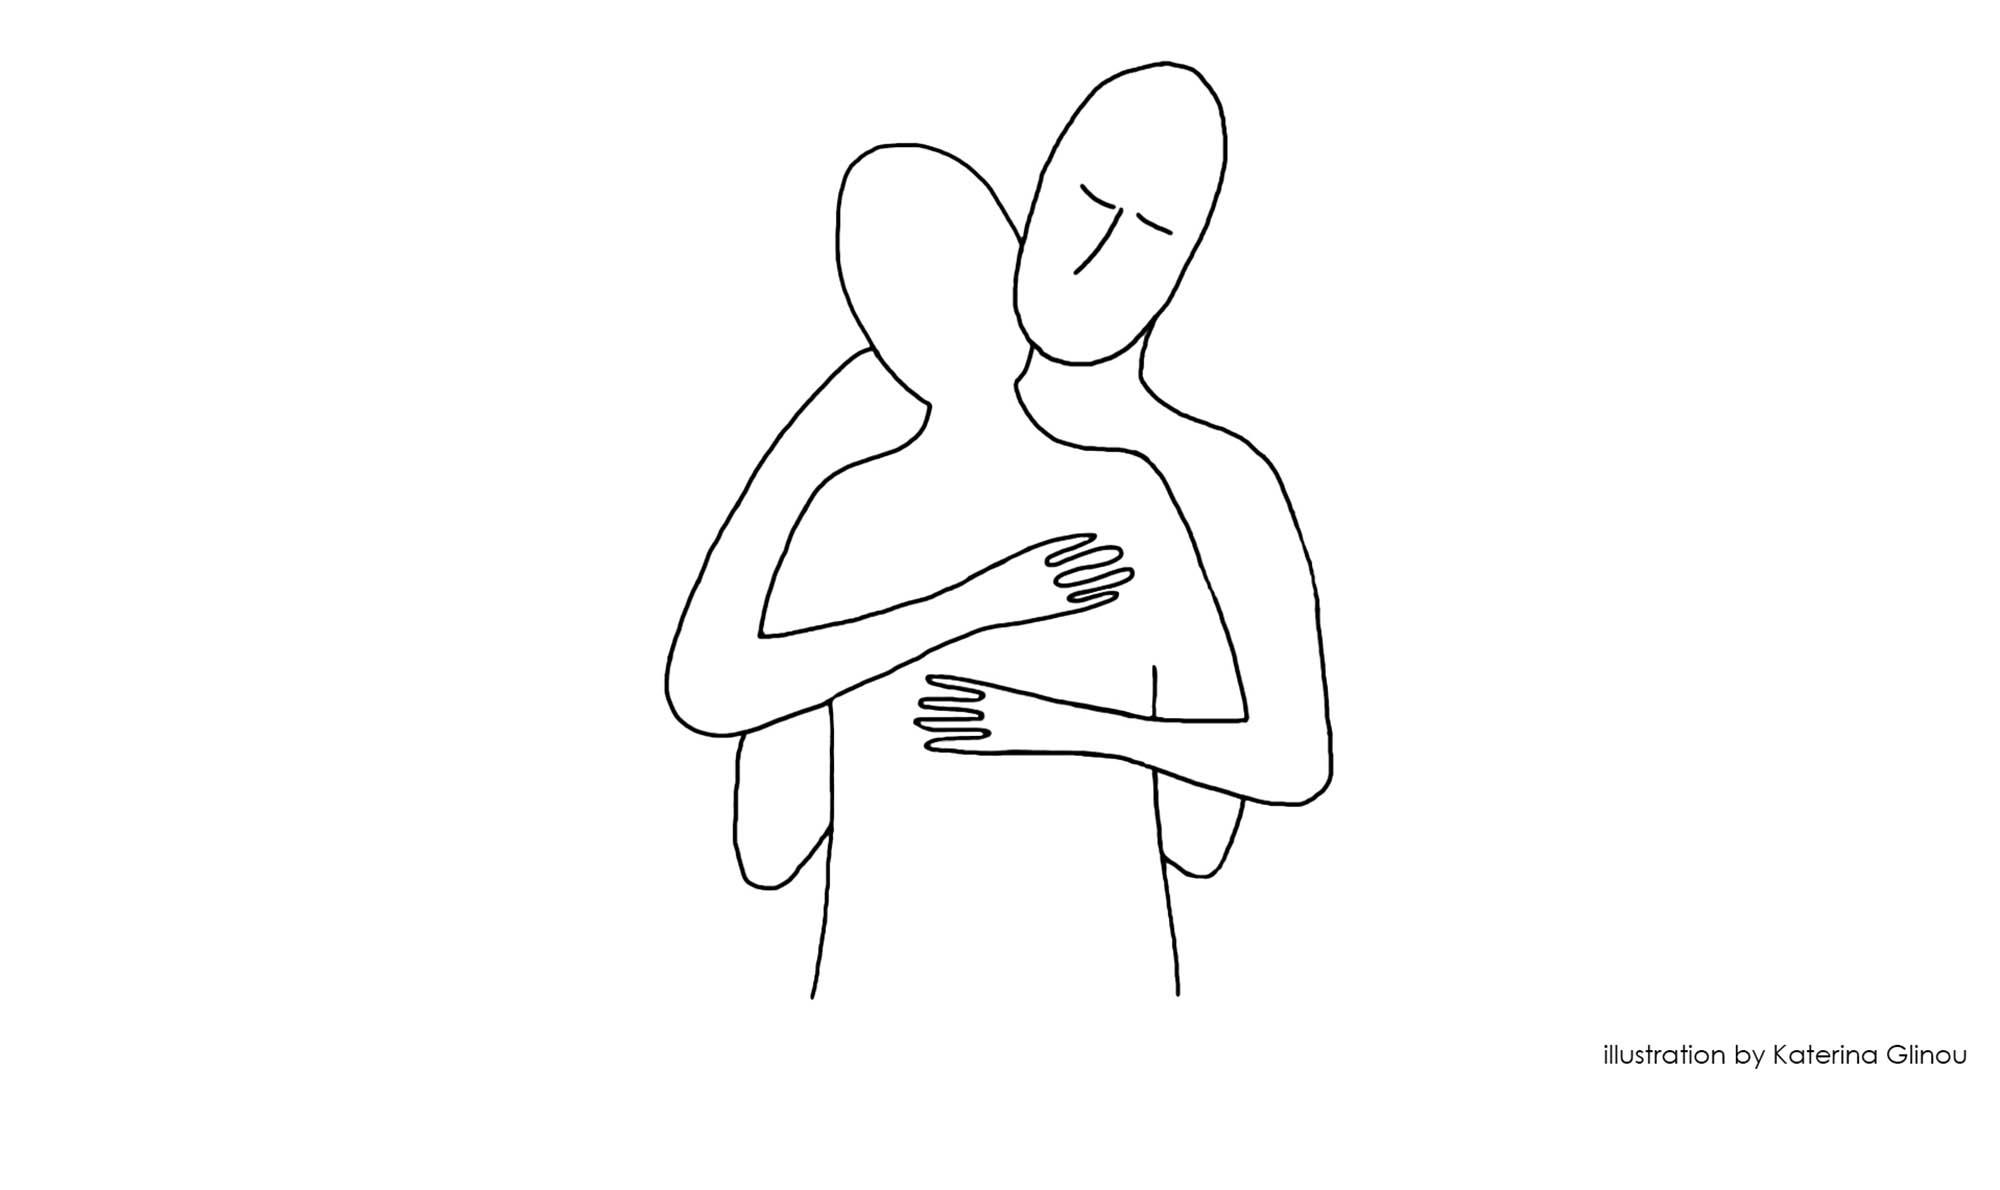 The Hug - Illustration Katerina Glinou